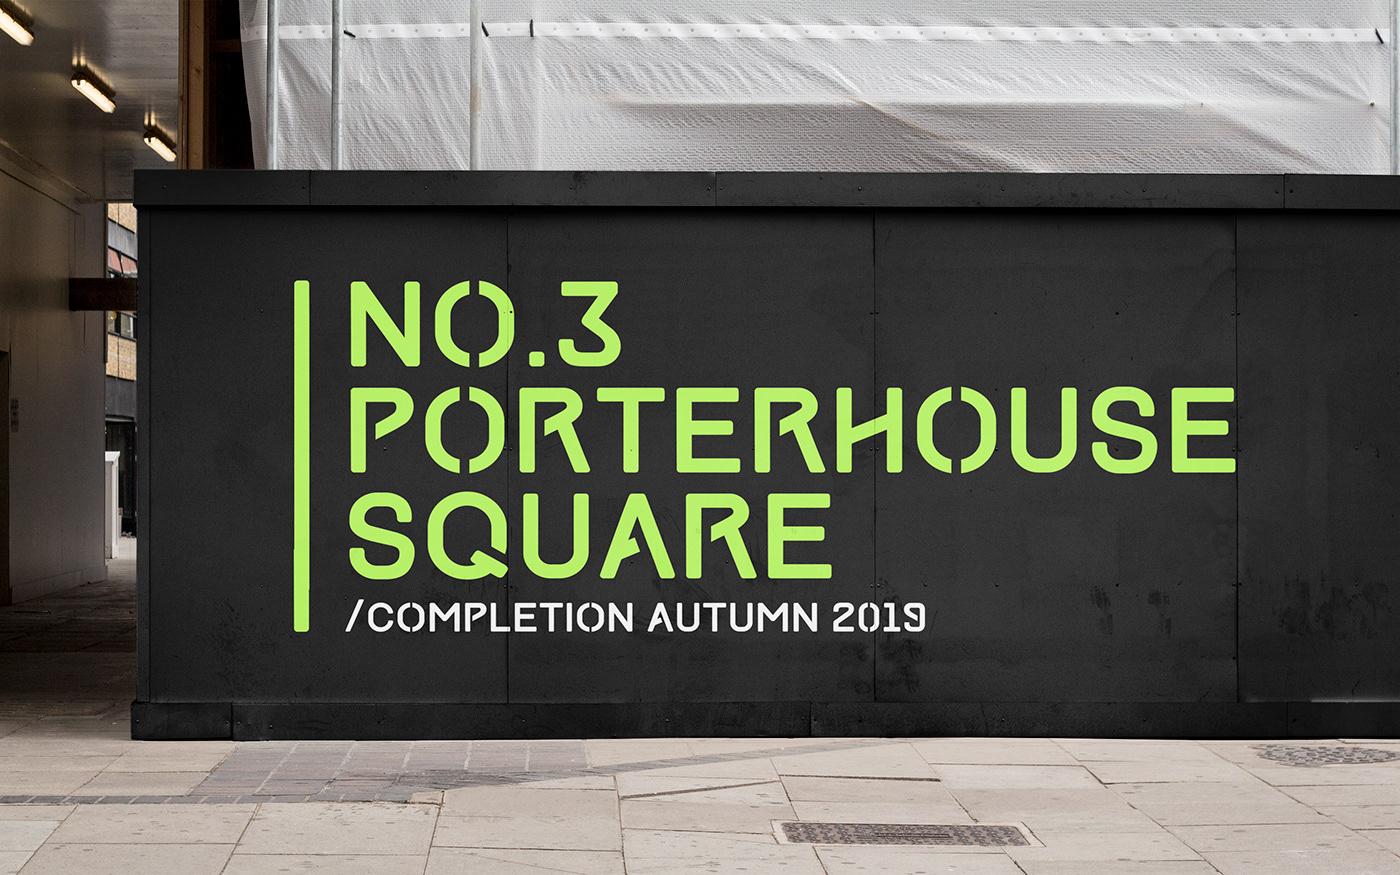 building Retail porthouse square construction Typeface materials complex contemporary Proposal